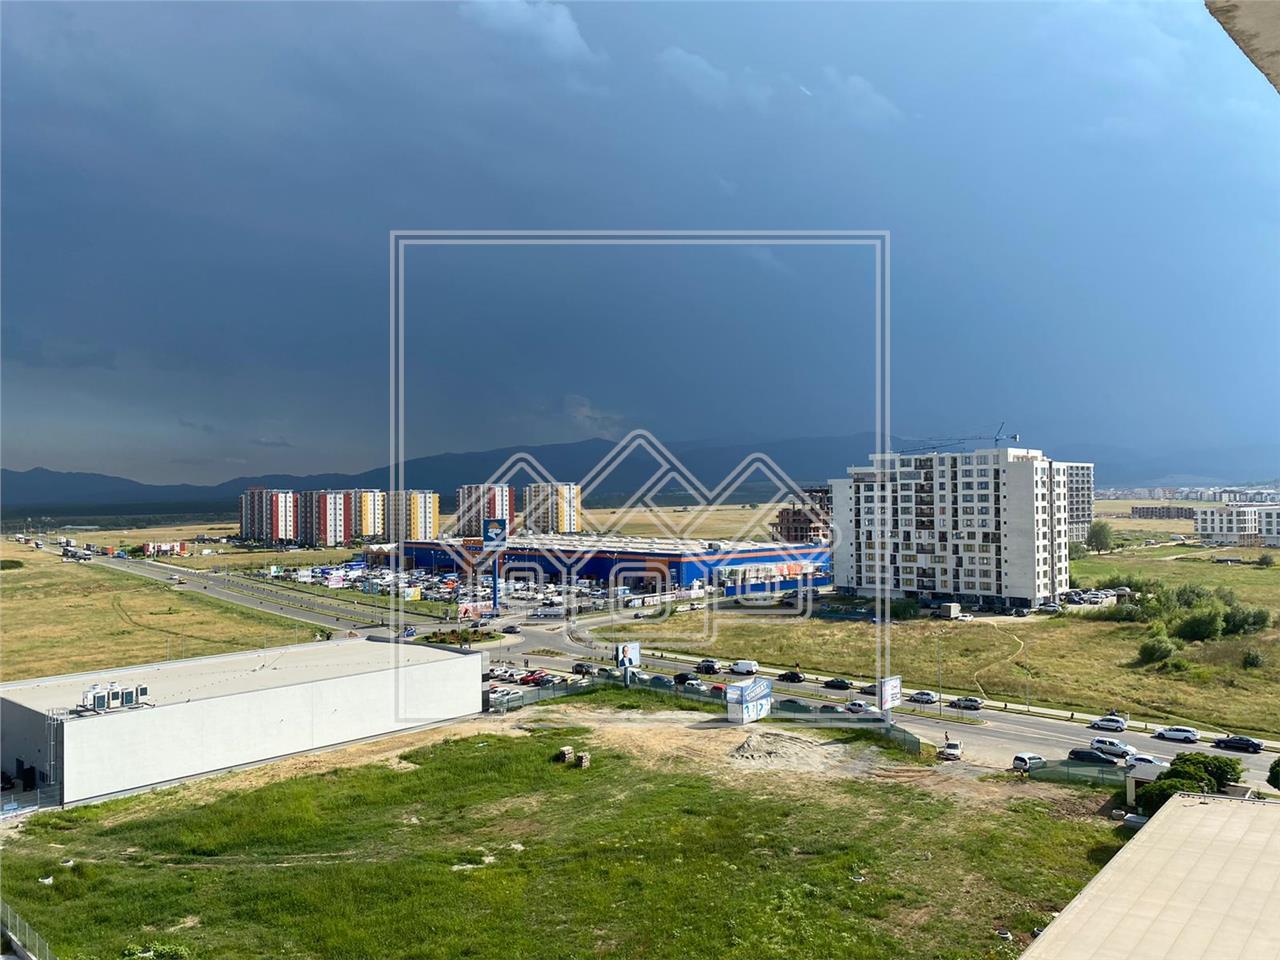 Penthouse de vanzare in Sibiu - 88.3 mp utili + terasa 65 mp